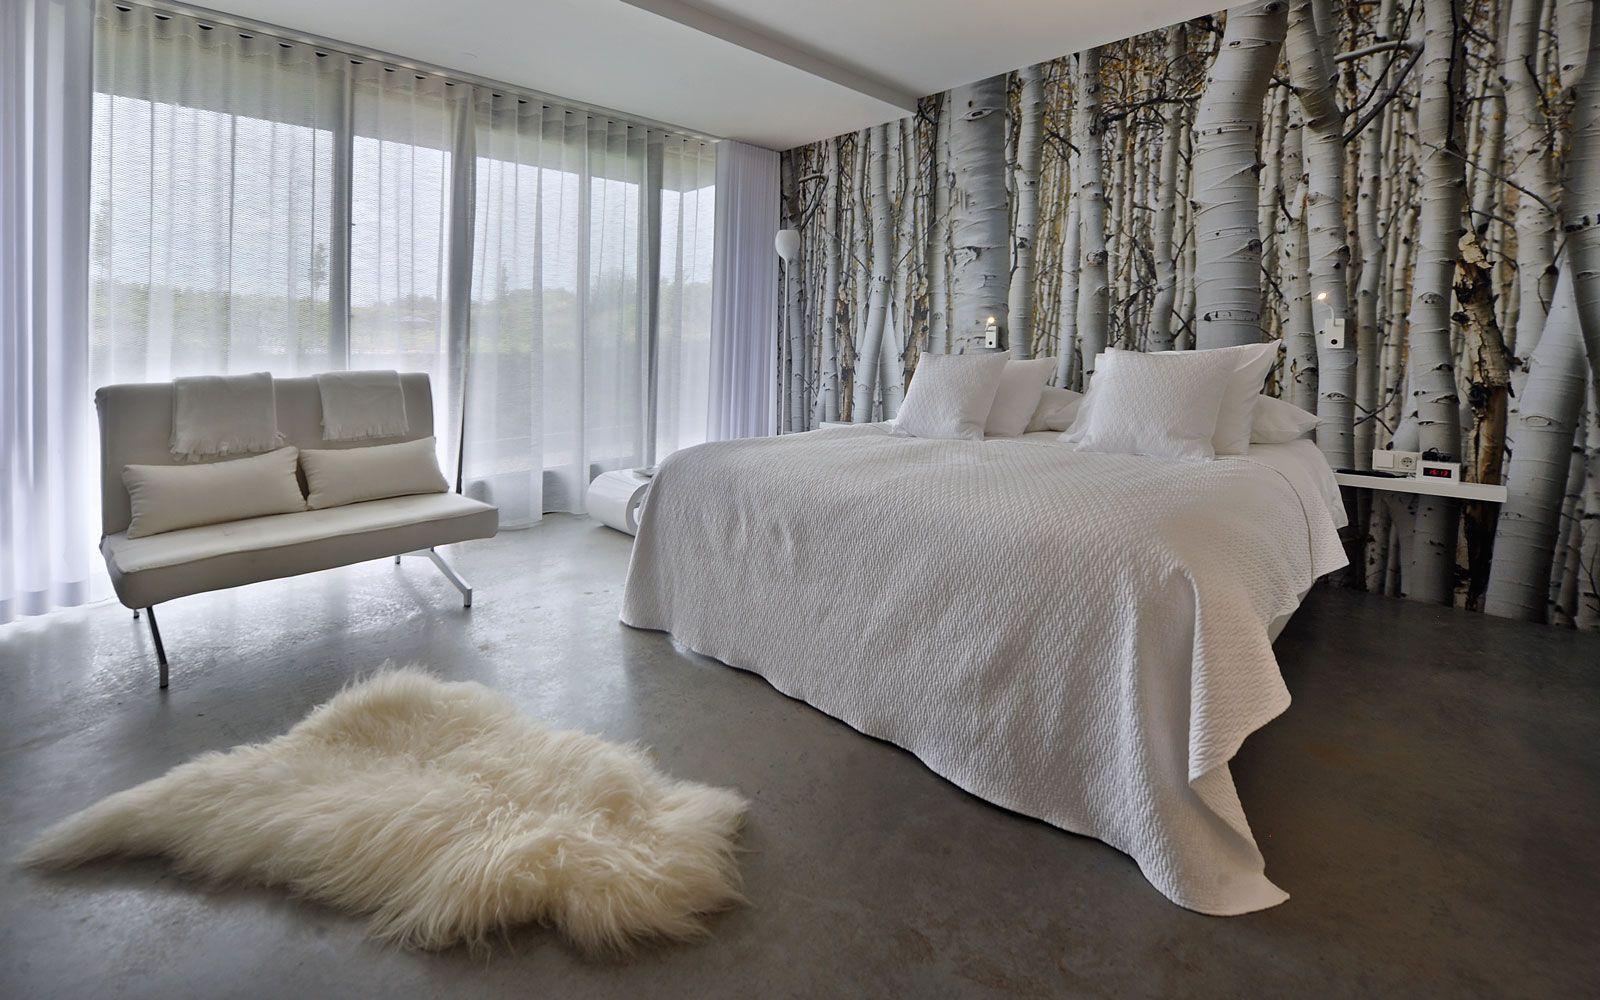 BEDROOM   AUPING   LA MARQUISE   HERTROIJS ARCHITEKTEN   PROJECT VIA ...